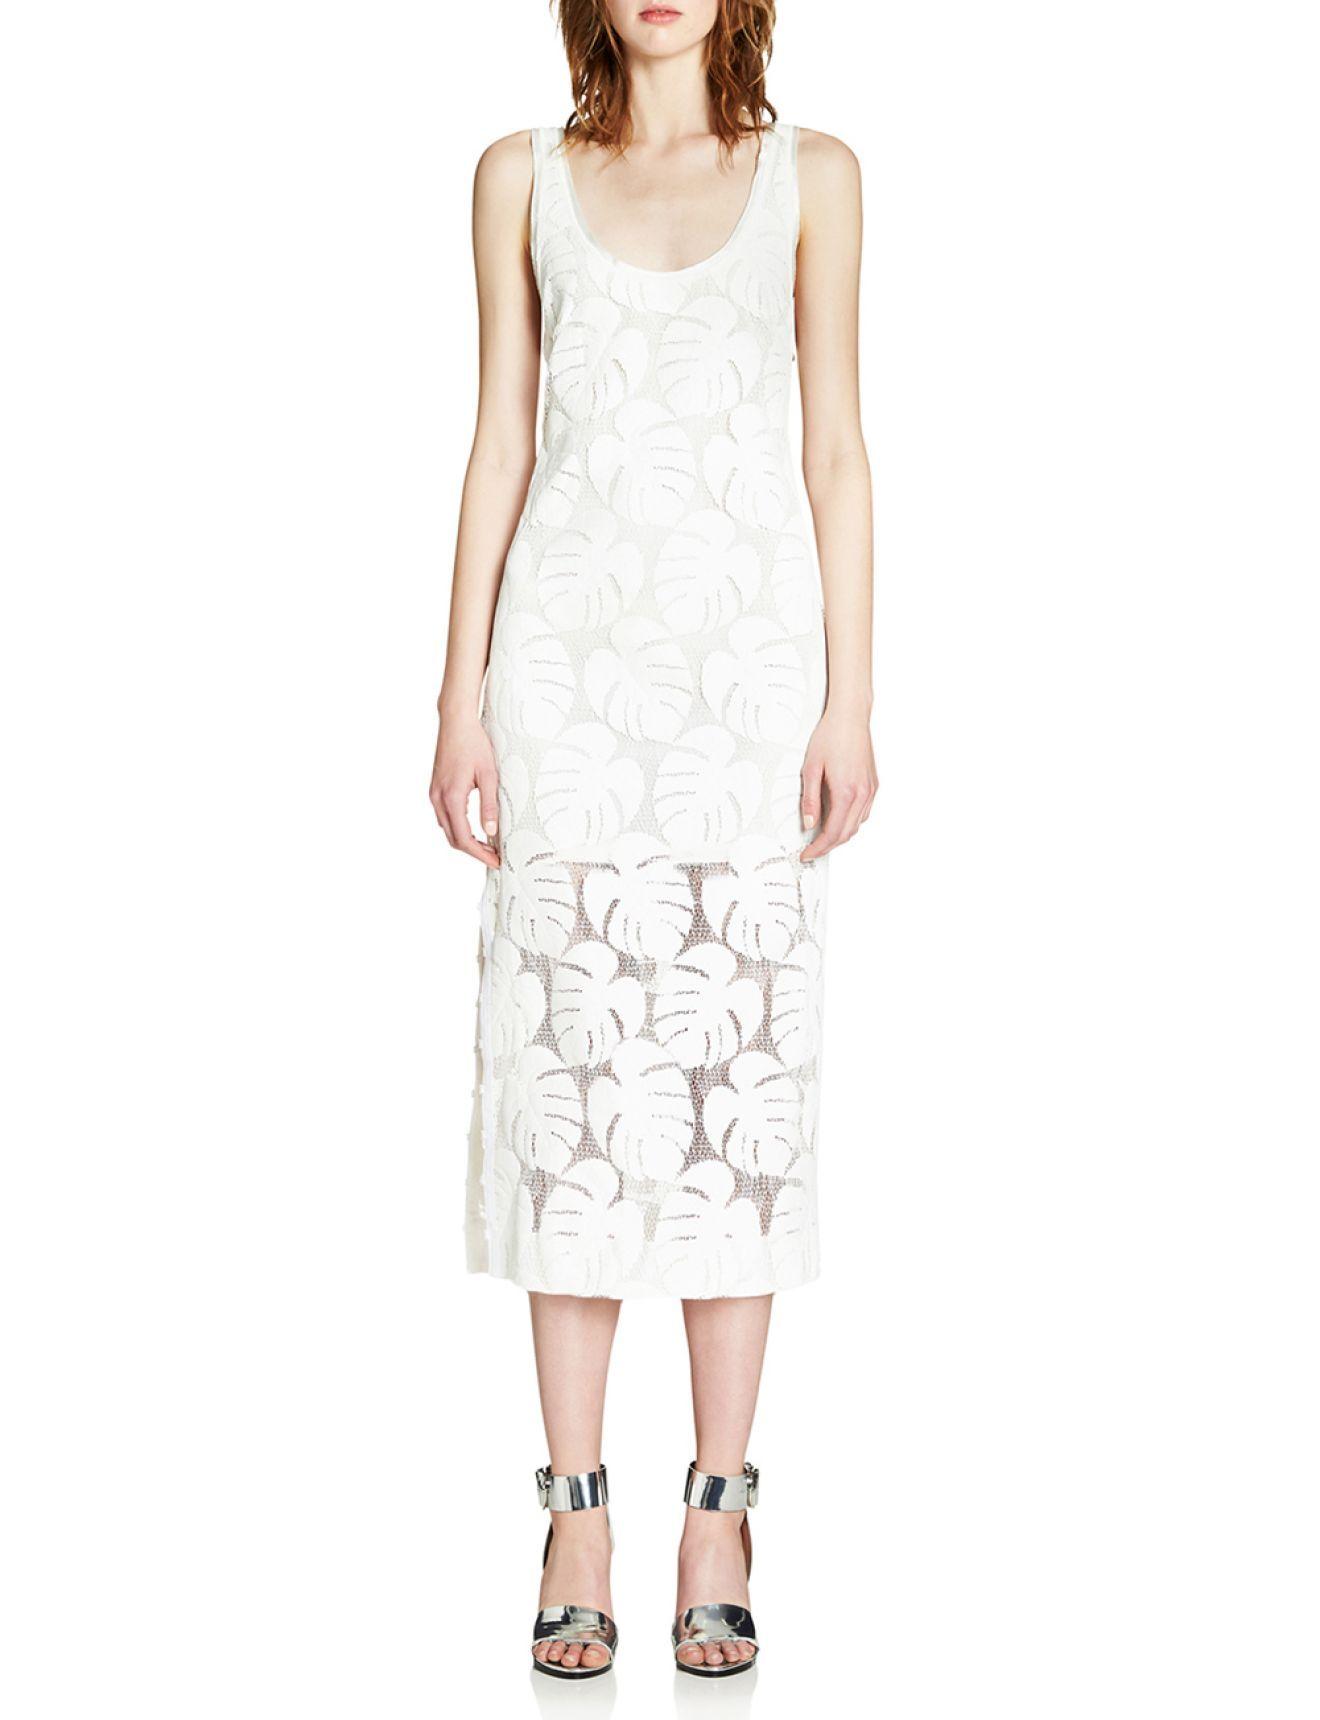 White dress david jones - Urban Jungle Dress David Jones